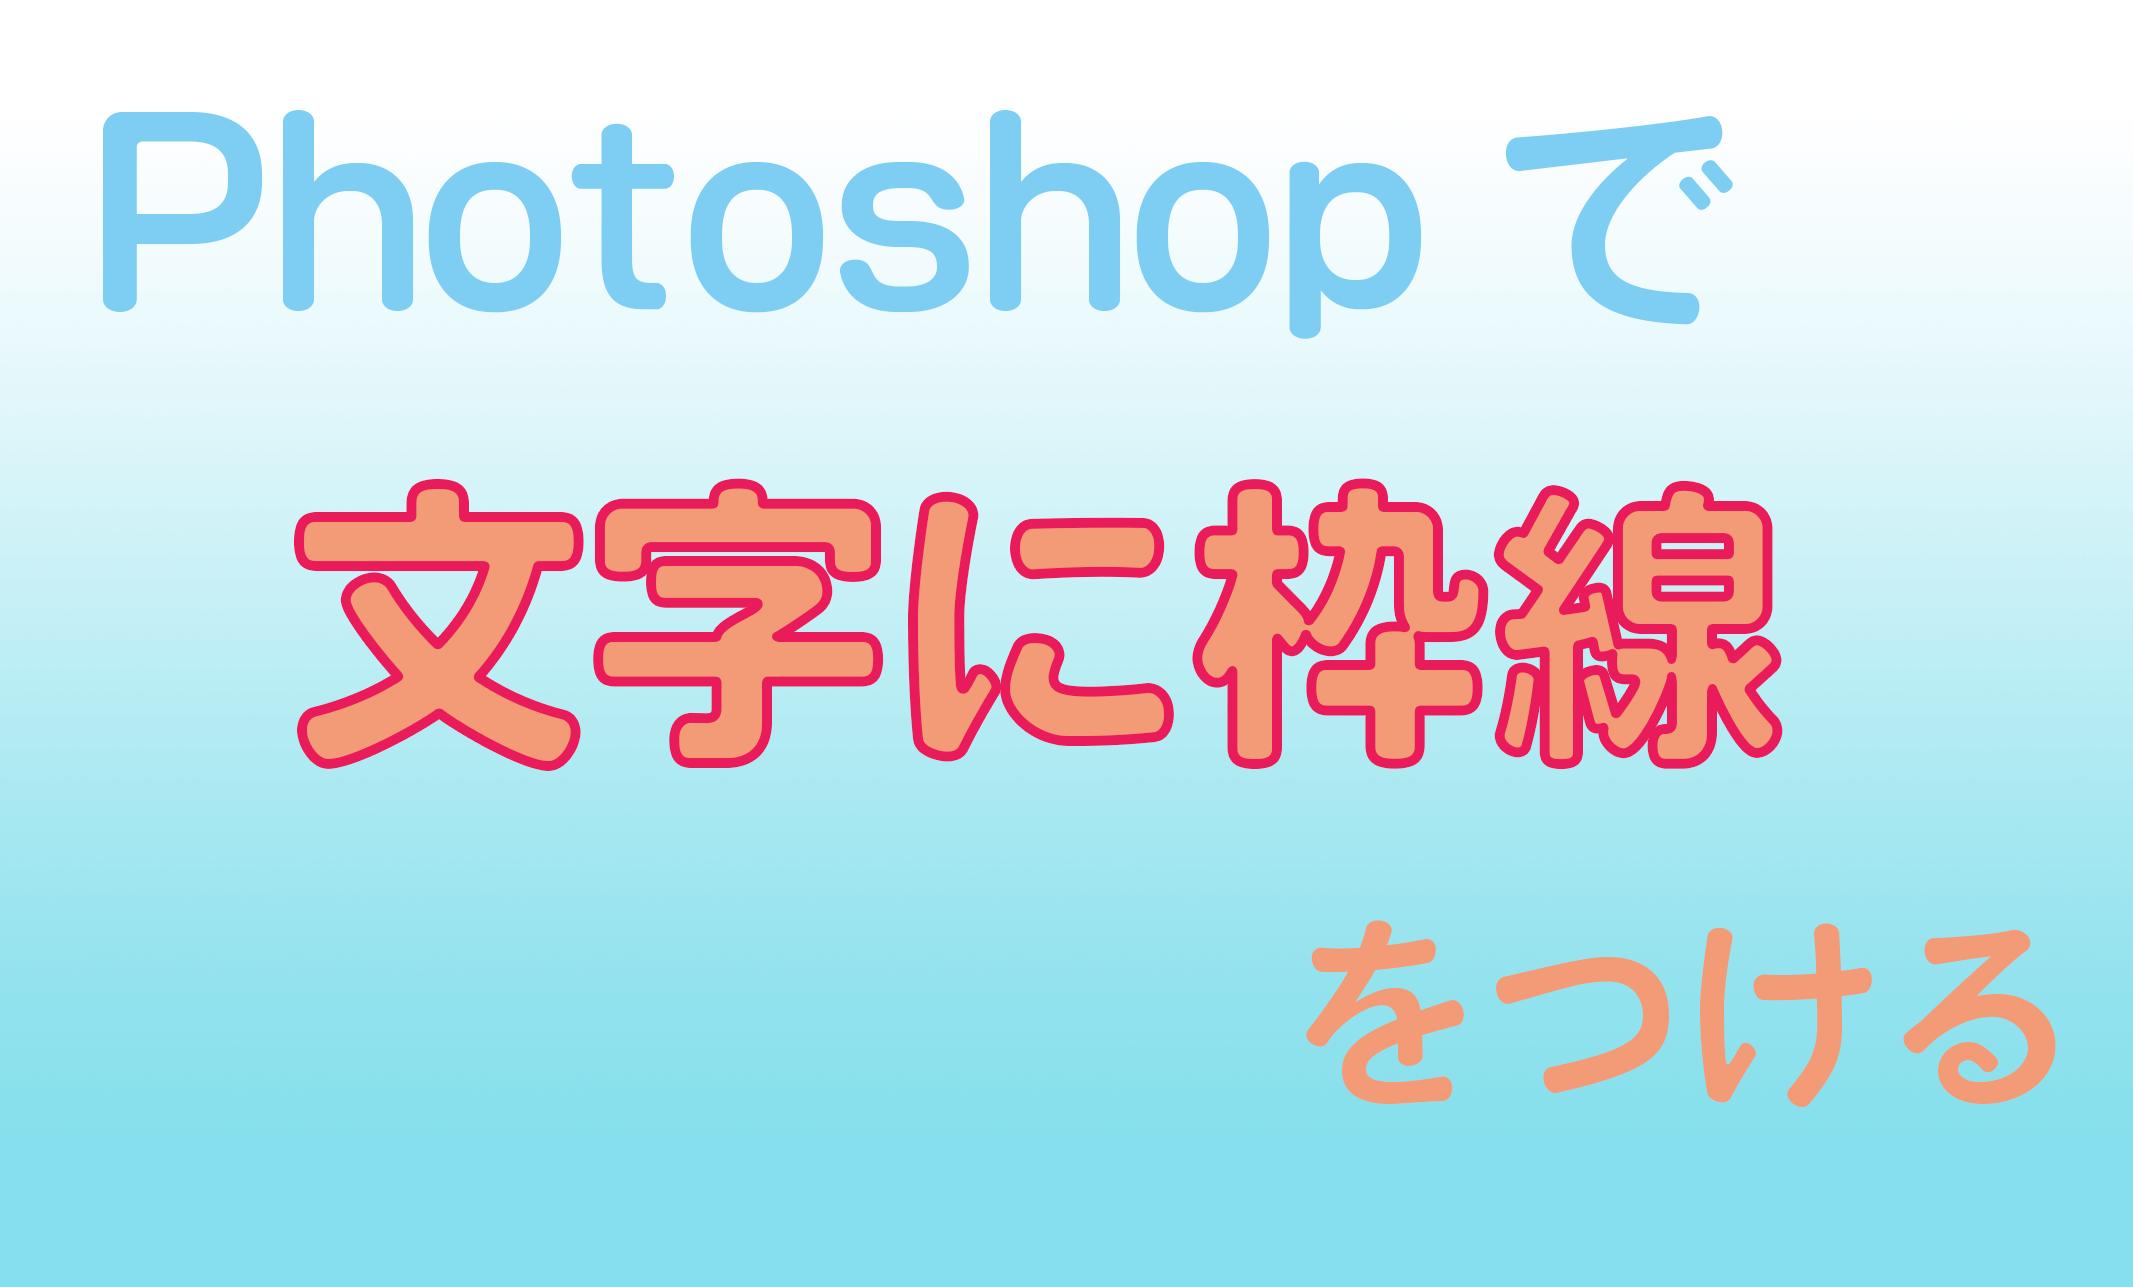 photoshopで文字の縁取りをする